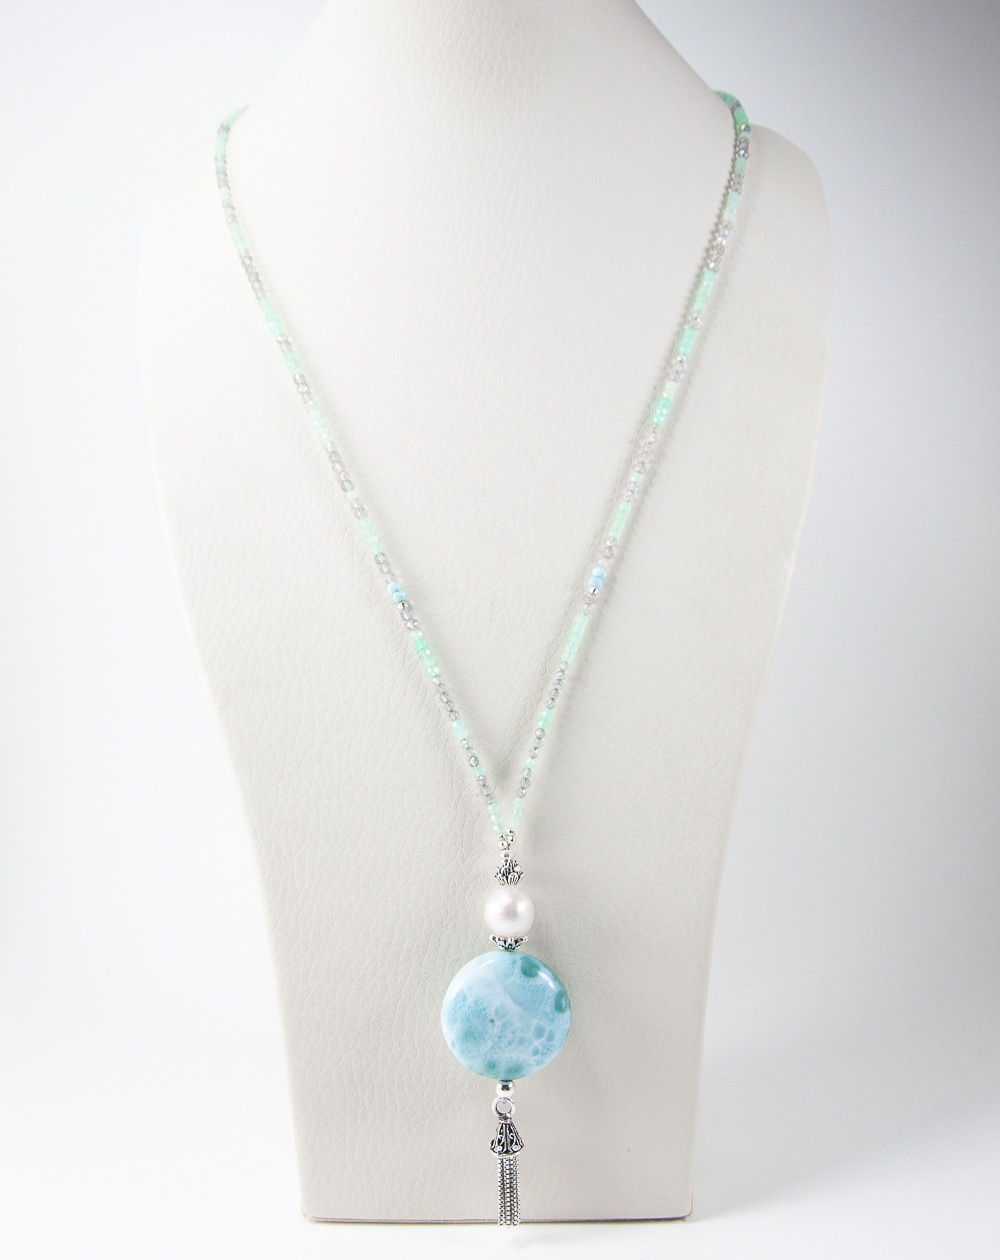 Collier mi long, Larimar, perle, Labradorite, Chrysoprase, Sanuk Création